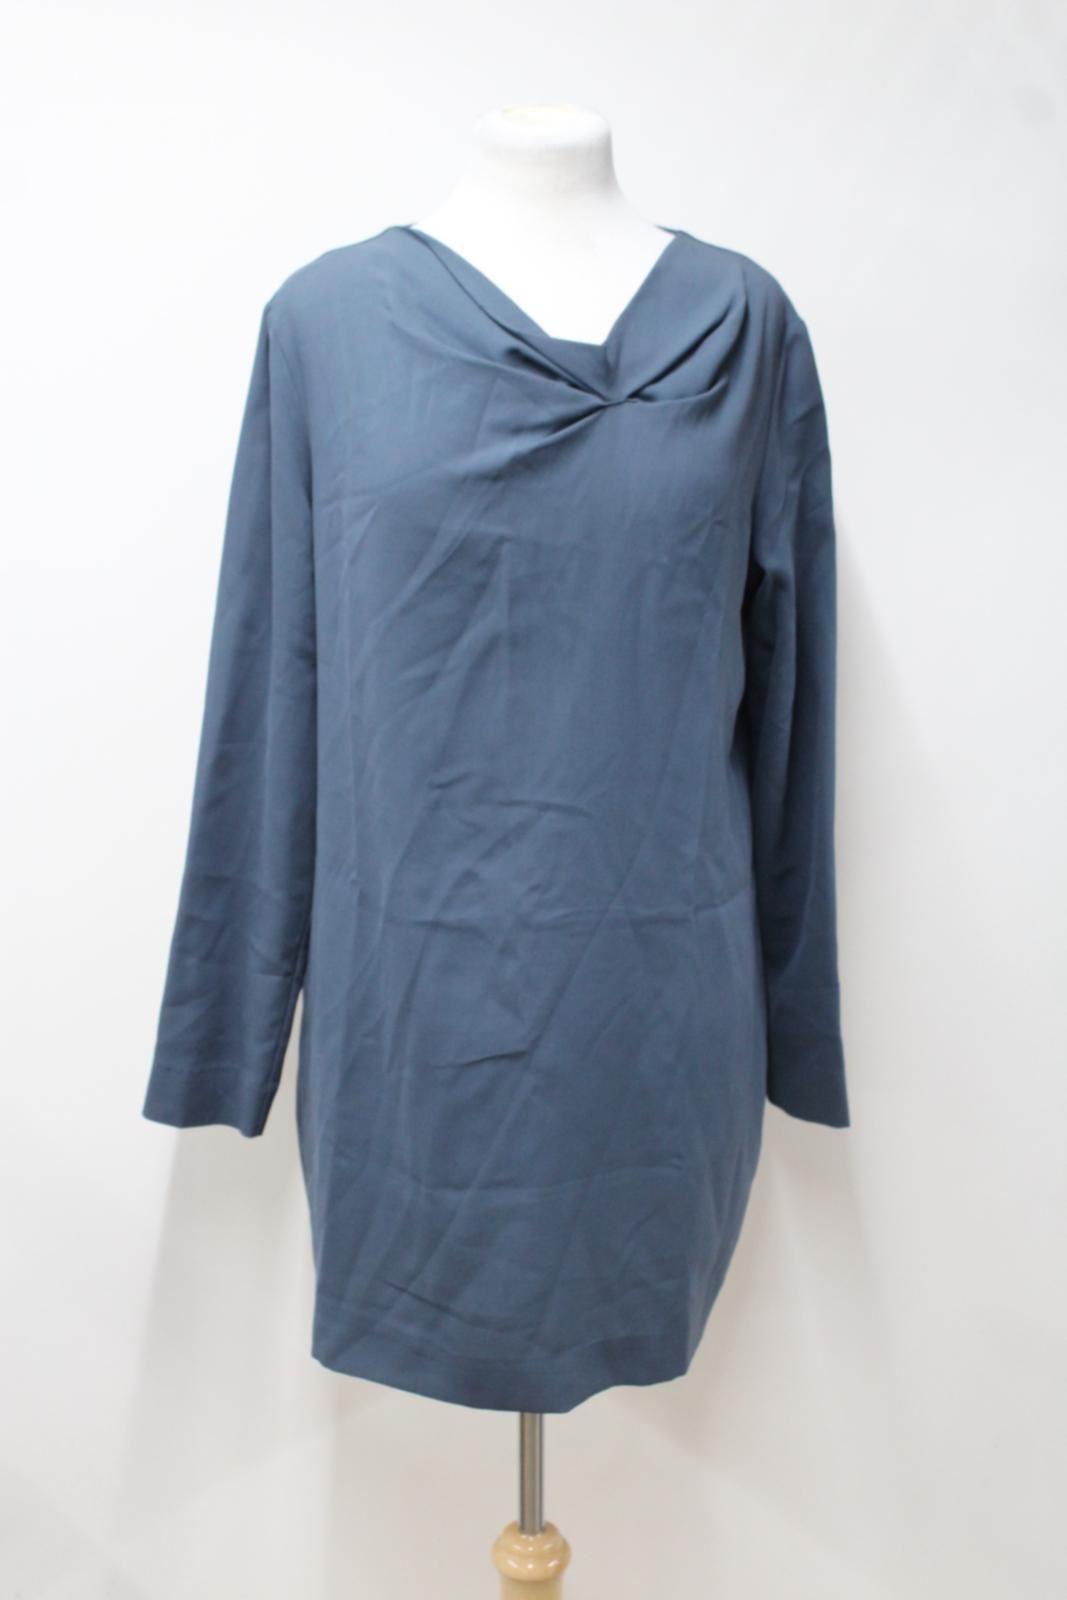 COS-Ladies-Slate-Blue-Silk-Blend-Asymmetric-Neck-Long-Sleeve-Dress-EU44-UK-L